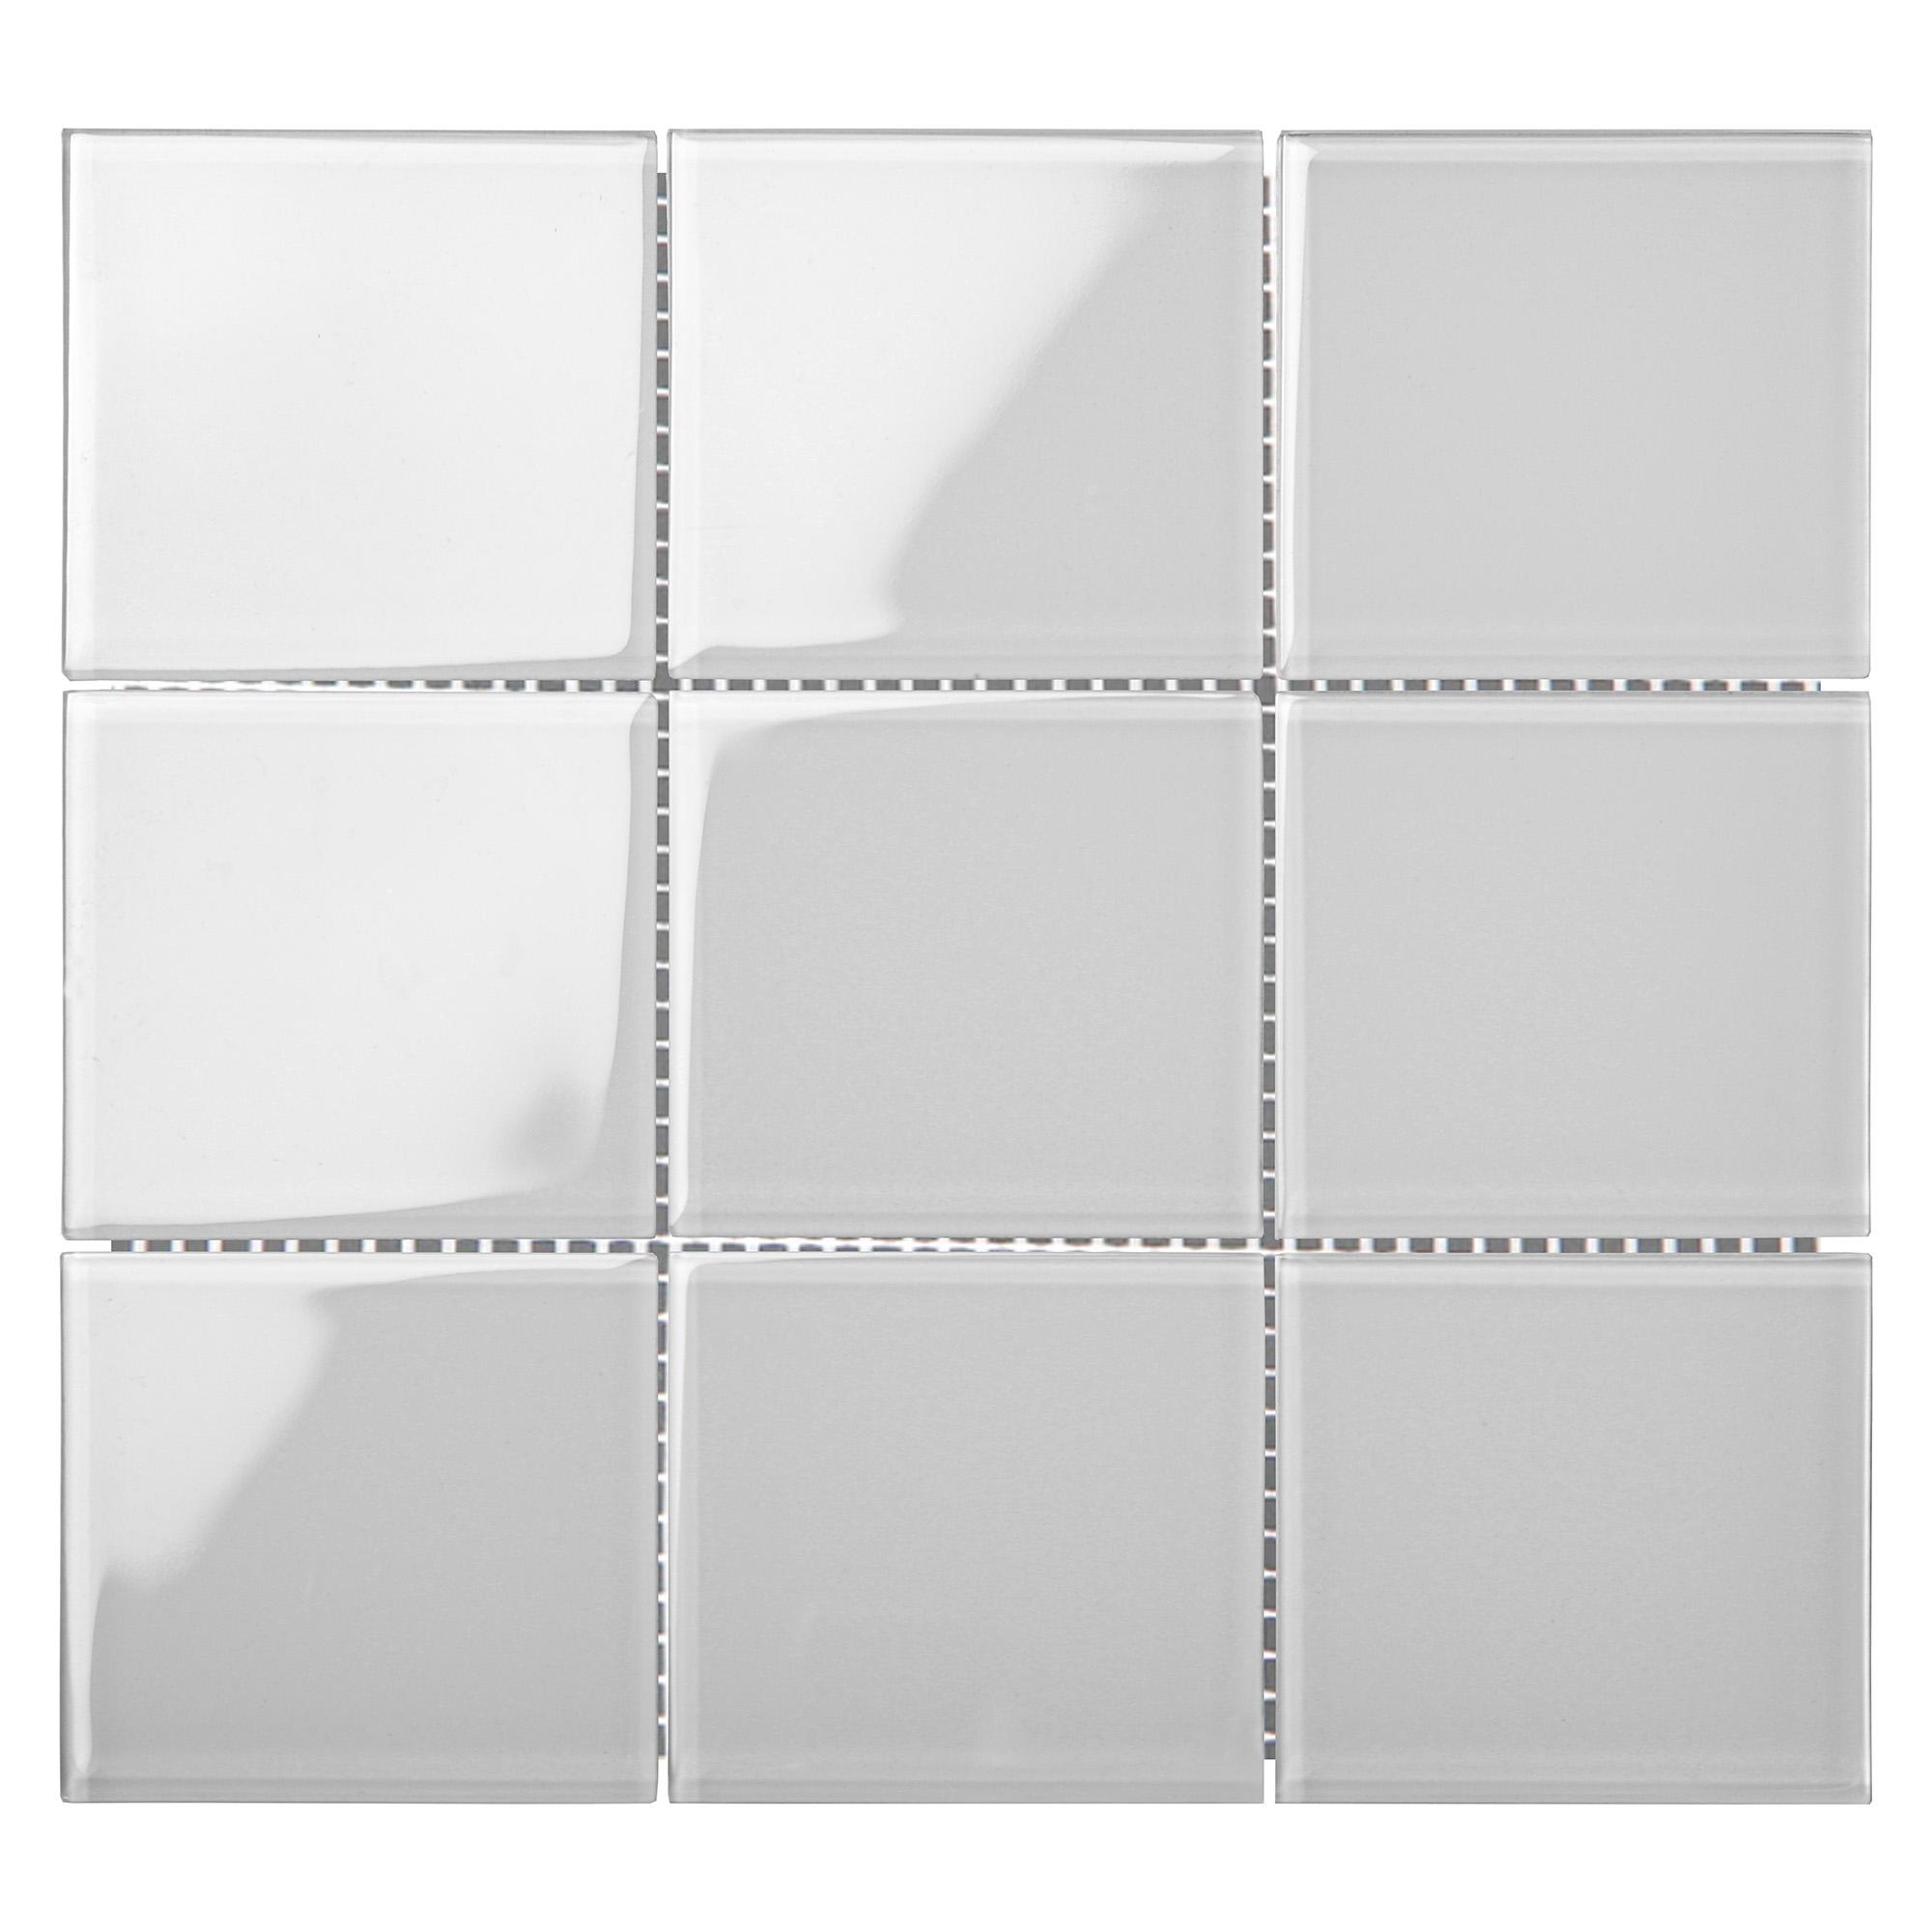 9898CR9042 - Pure White-GLASS TILE